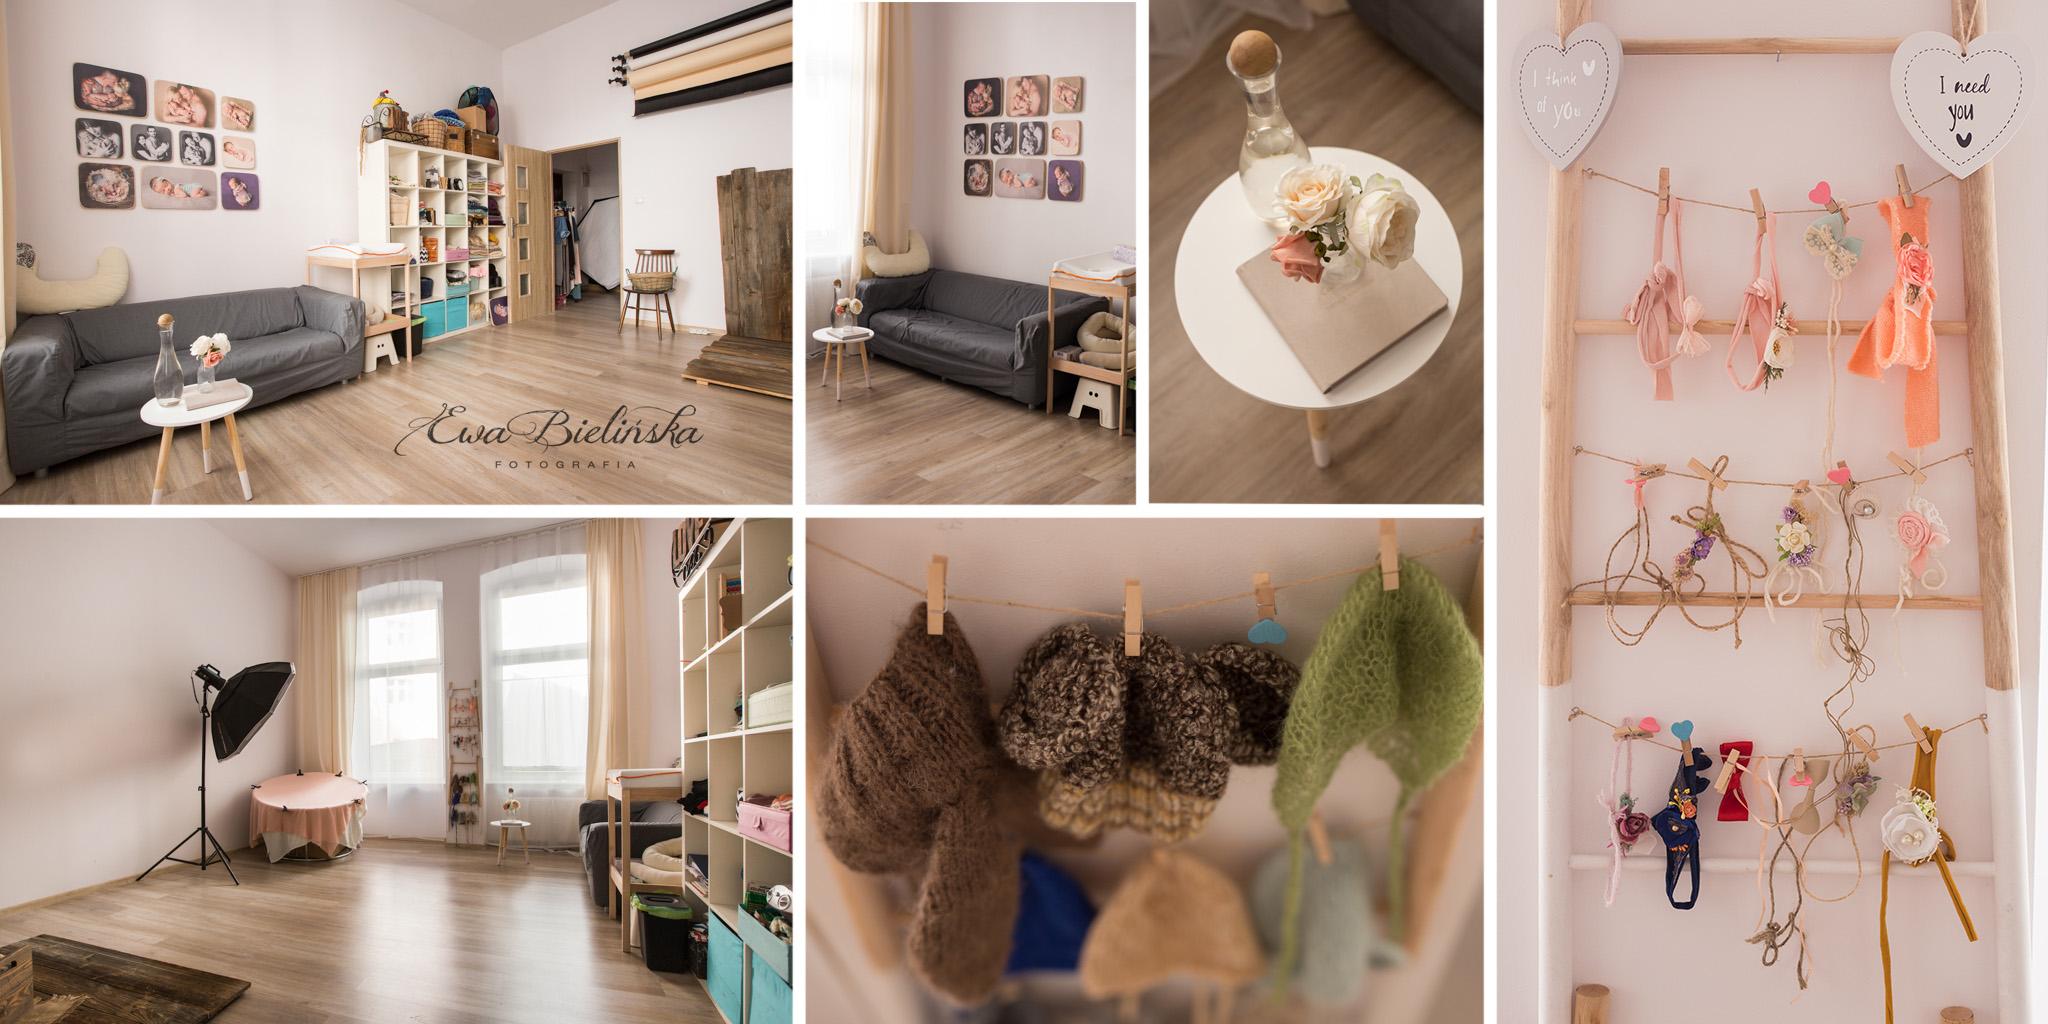 bielinska_studio